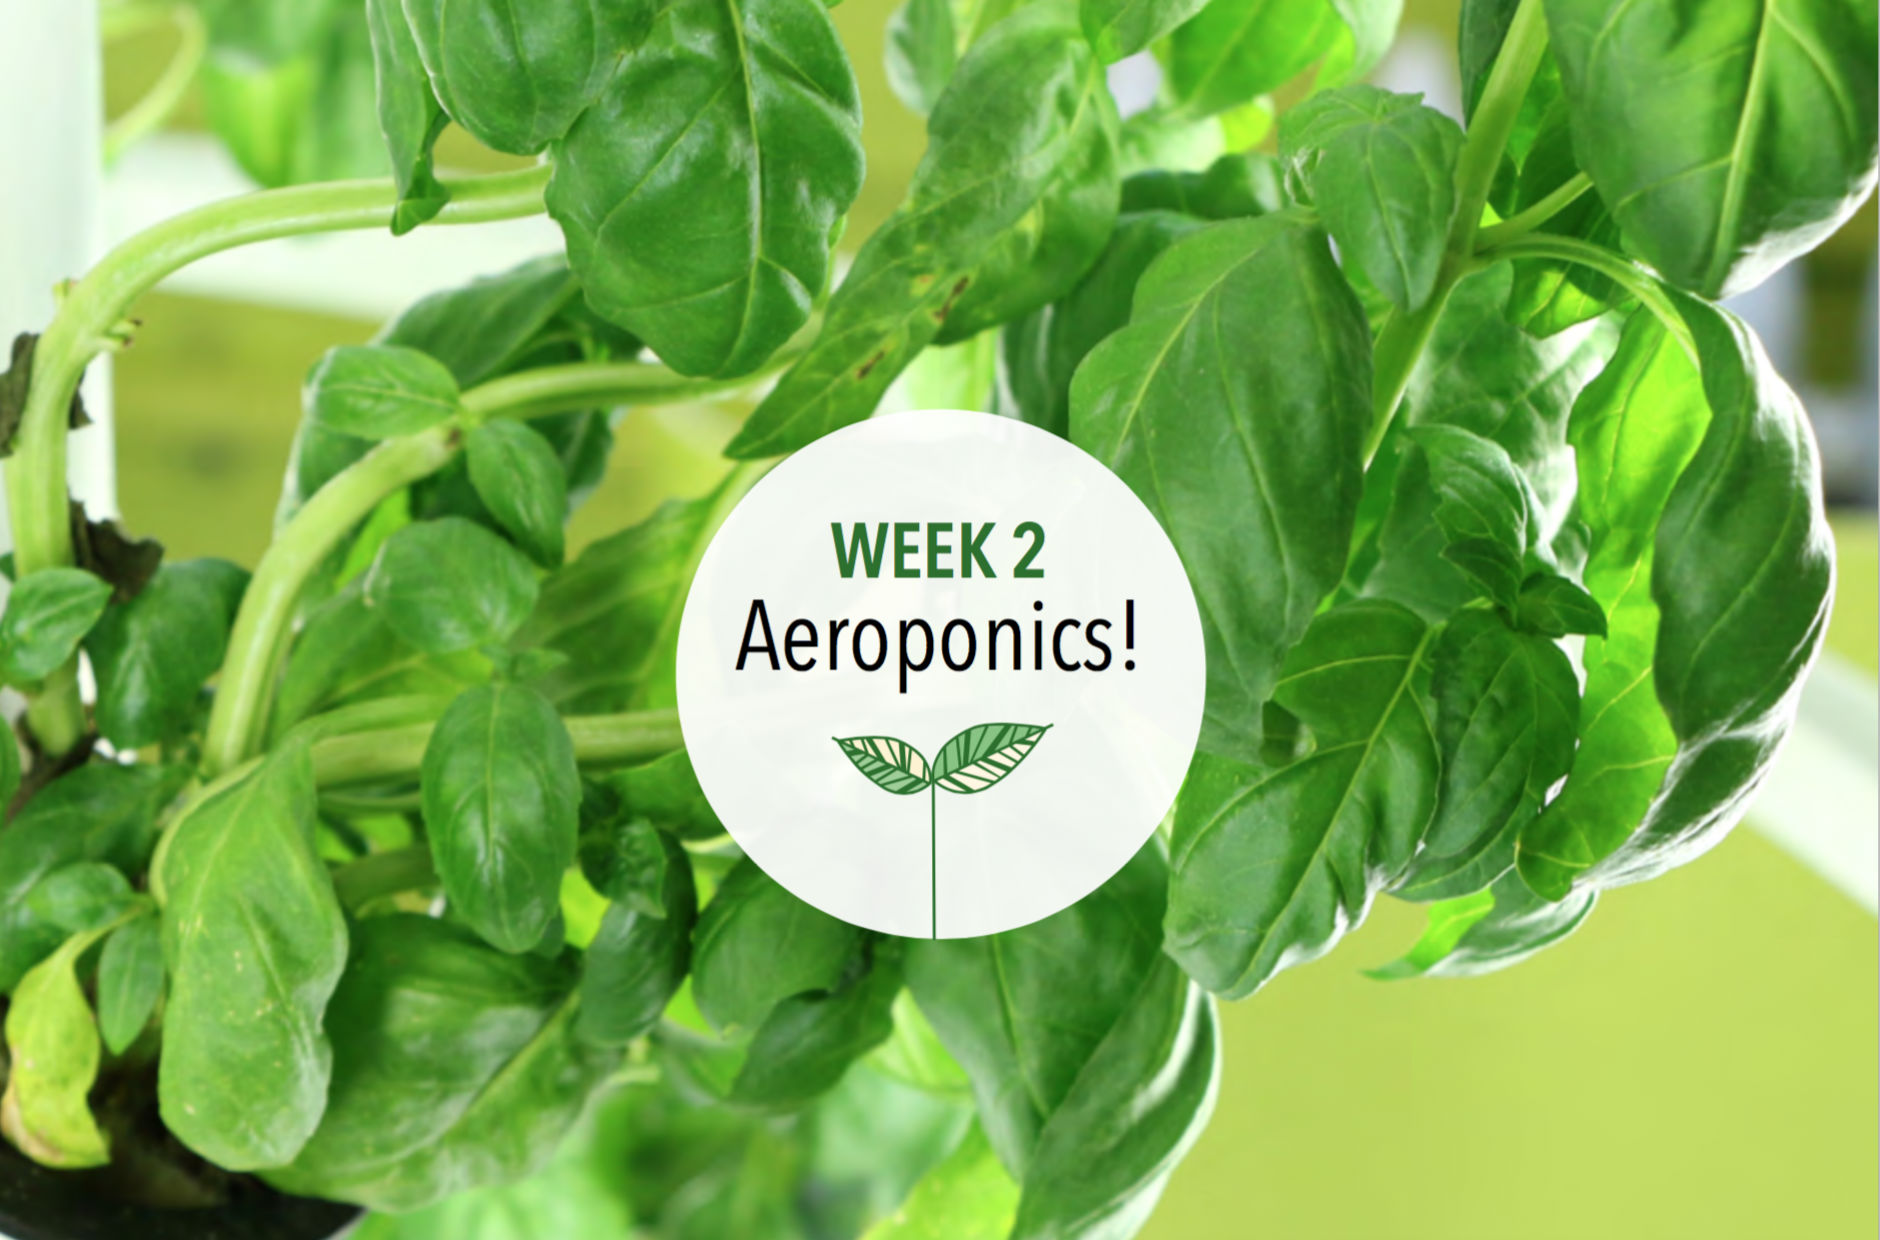 Week 2: Aeroponics!